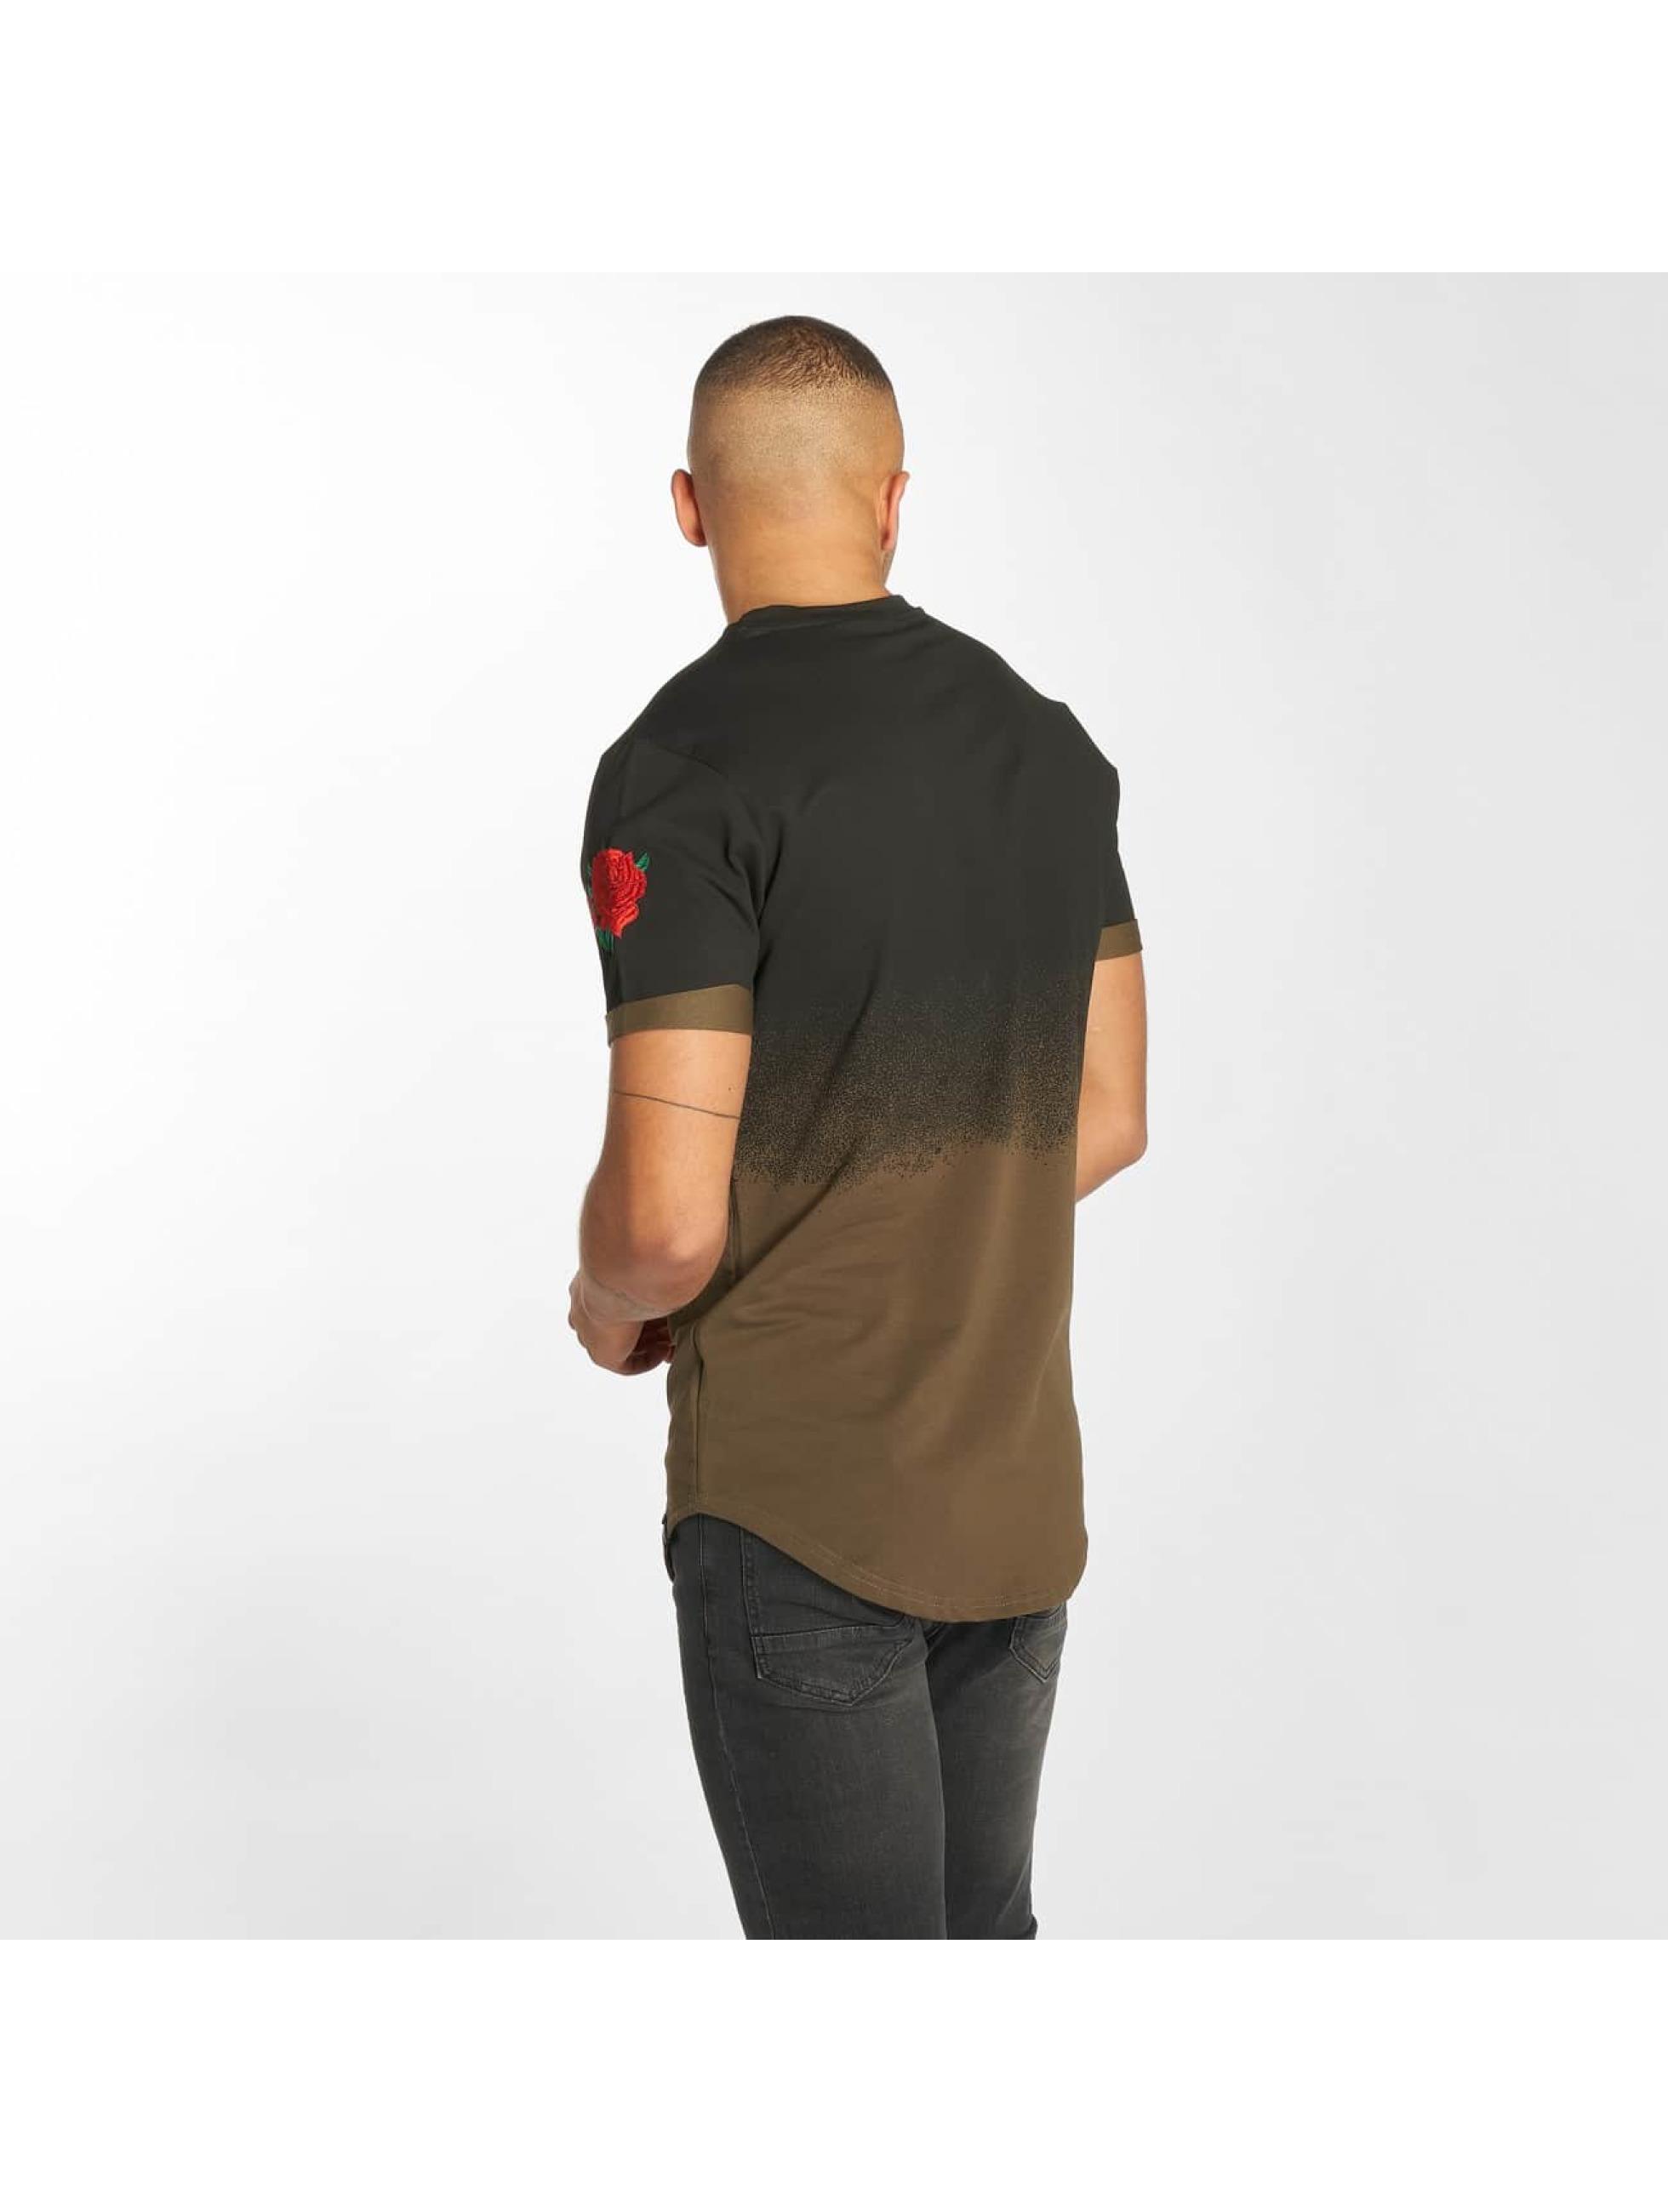 Hechbone T-Shirt Roses kaki